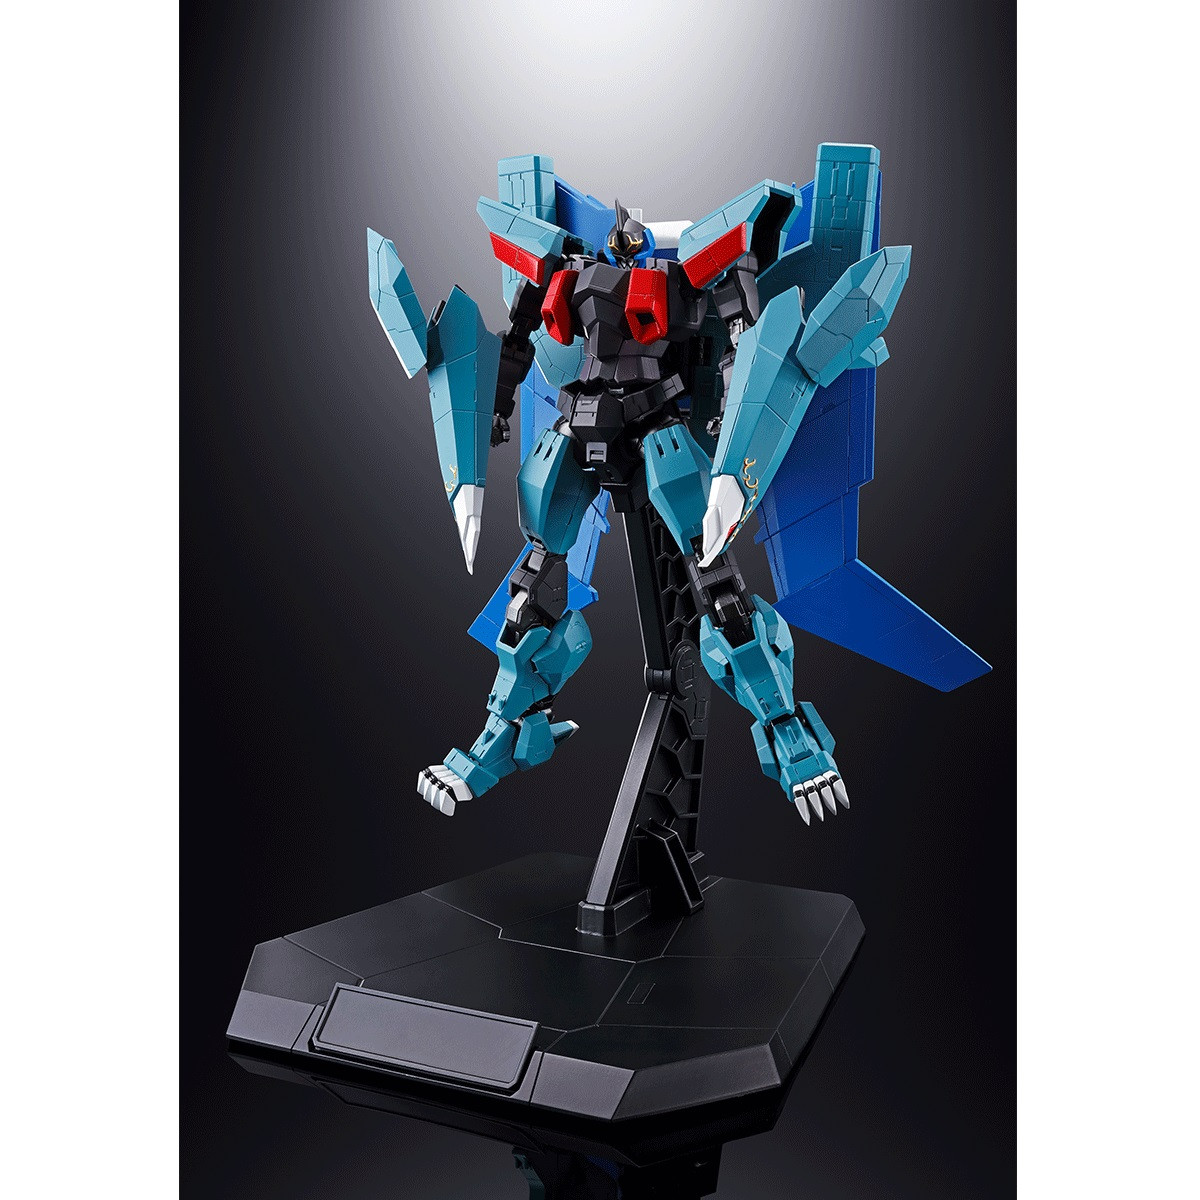 Black Wing Soul of Chogokin Ver Super Beast Machine God Dancouga Figure